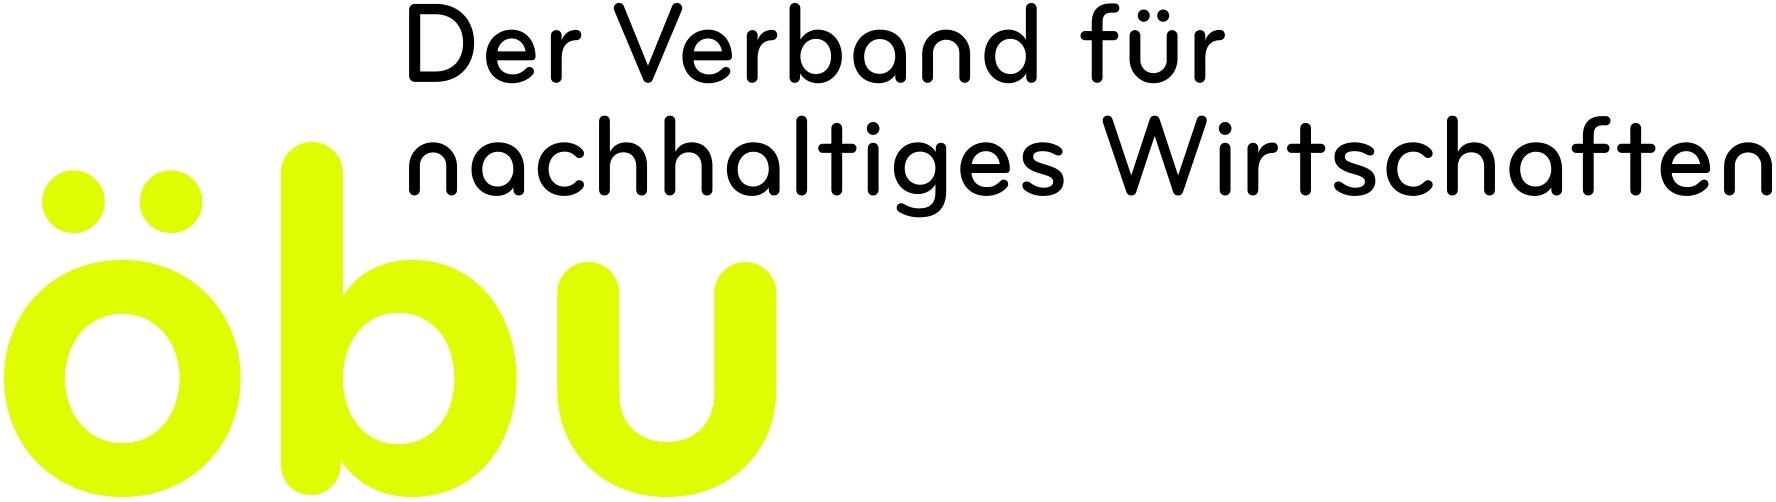 OBU switzerland.jpg